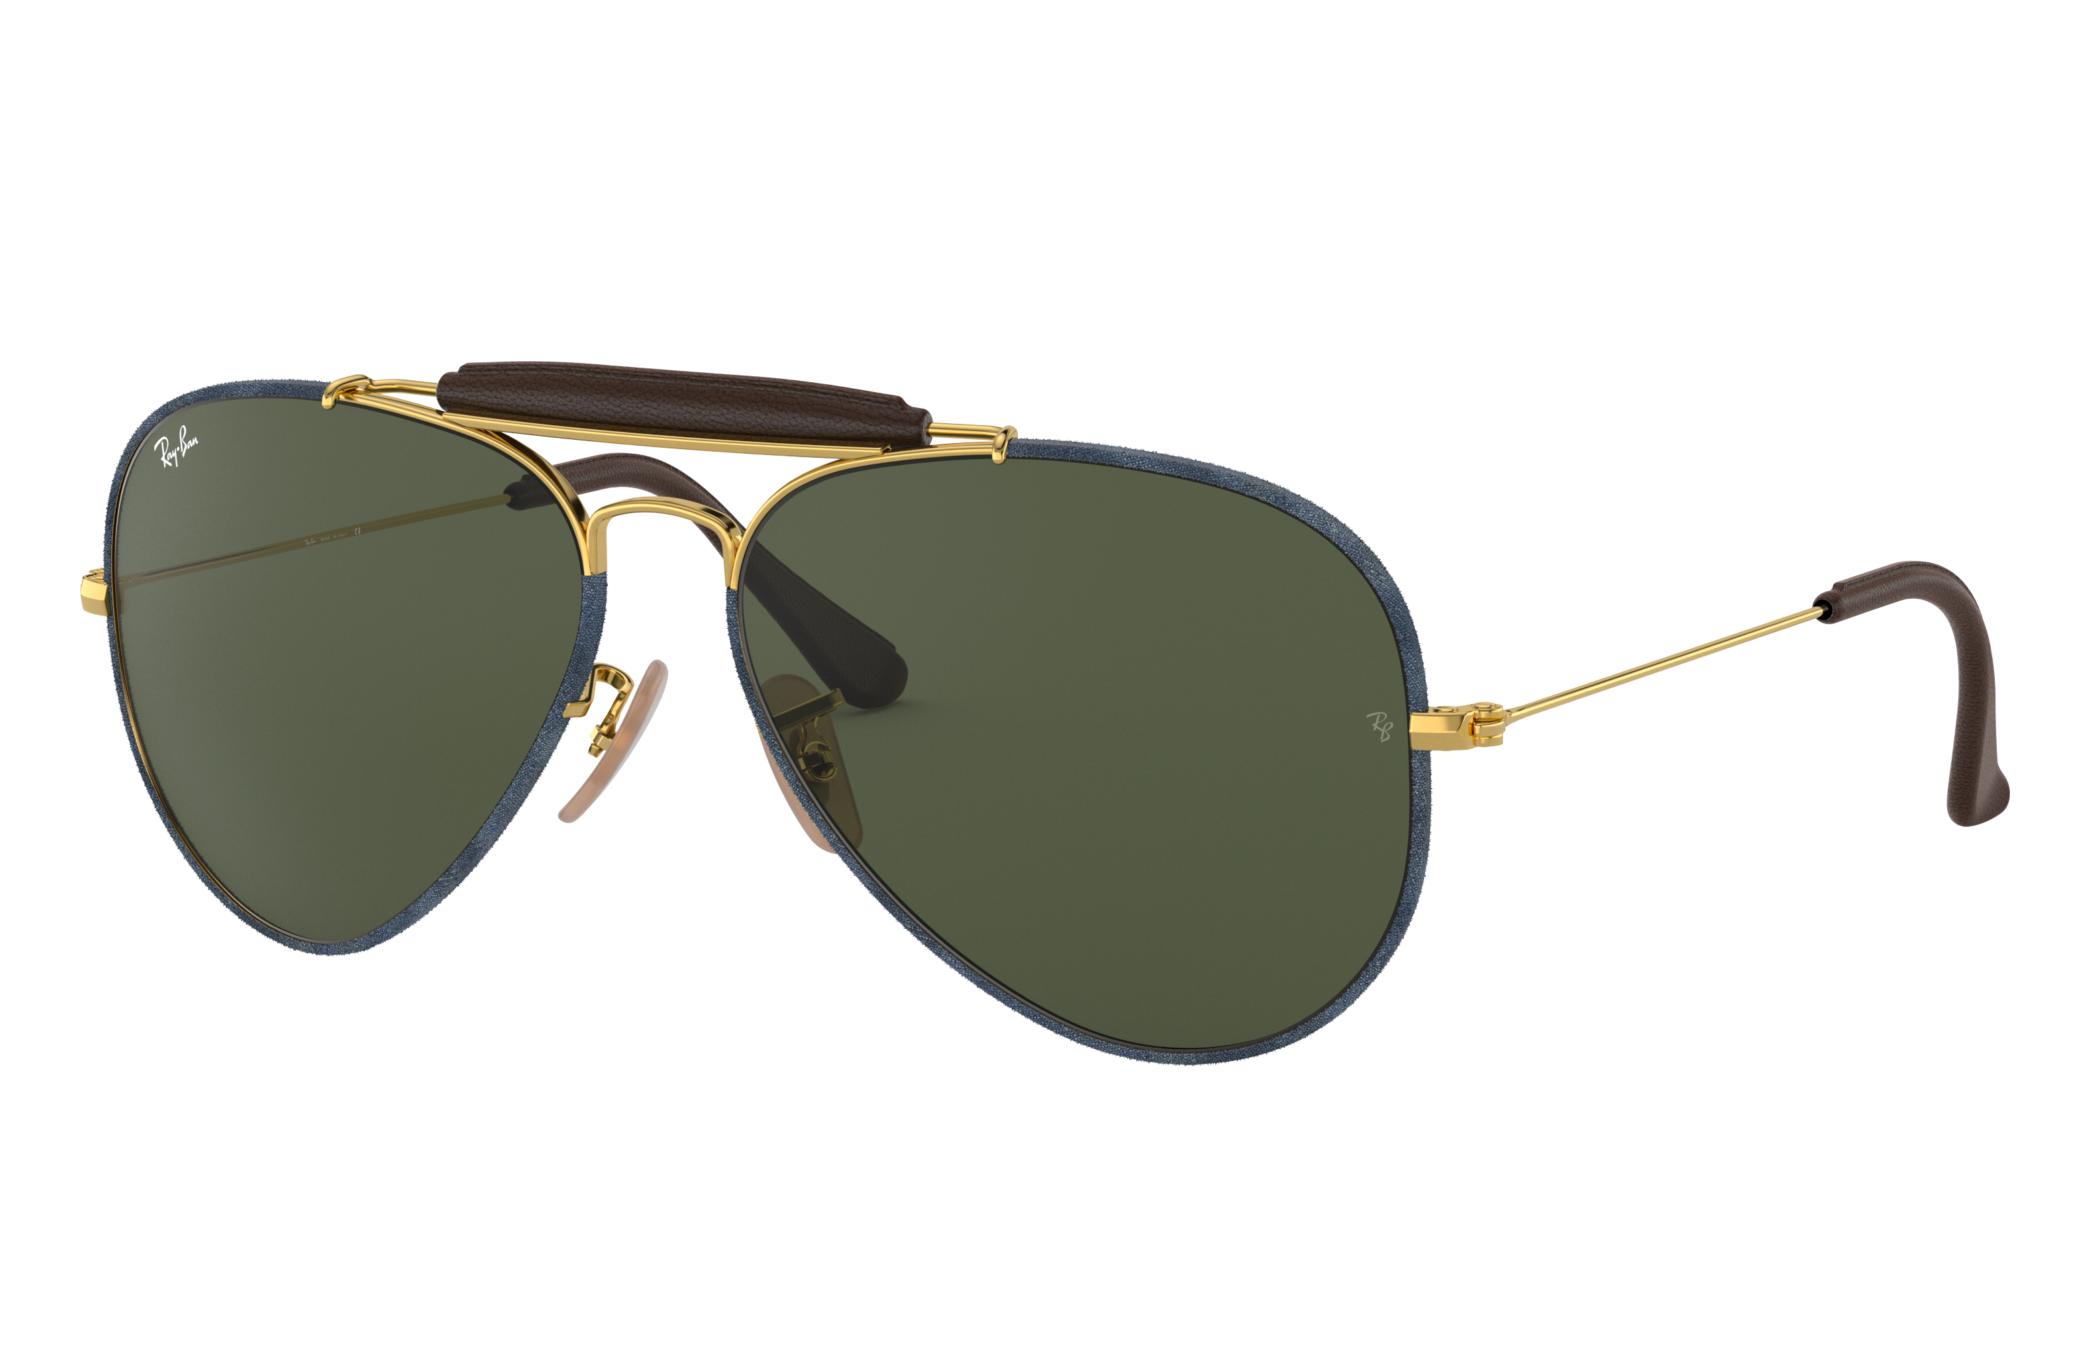 Ray-Ban Outdoorsman Craft Gold, Green Lenses - RB3422Q